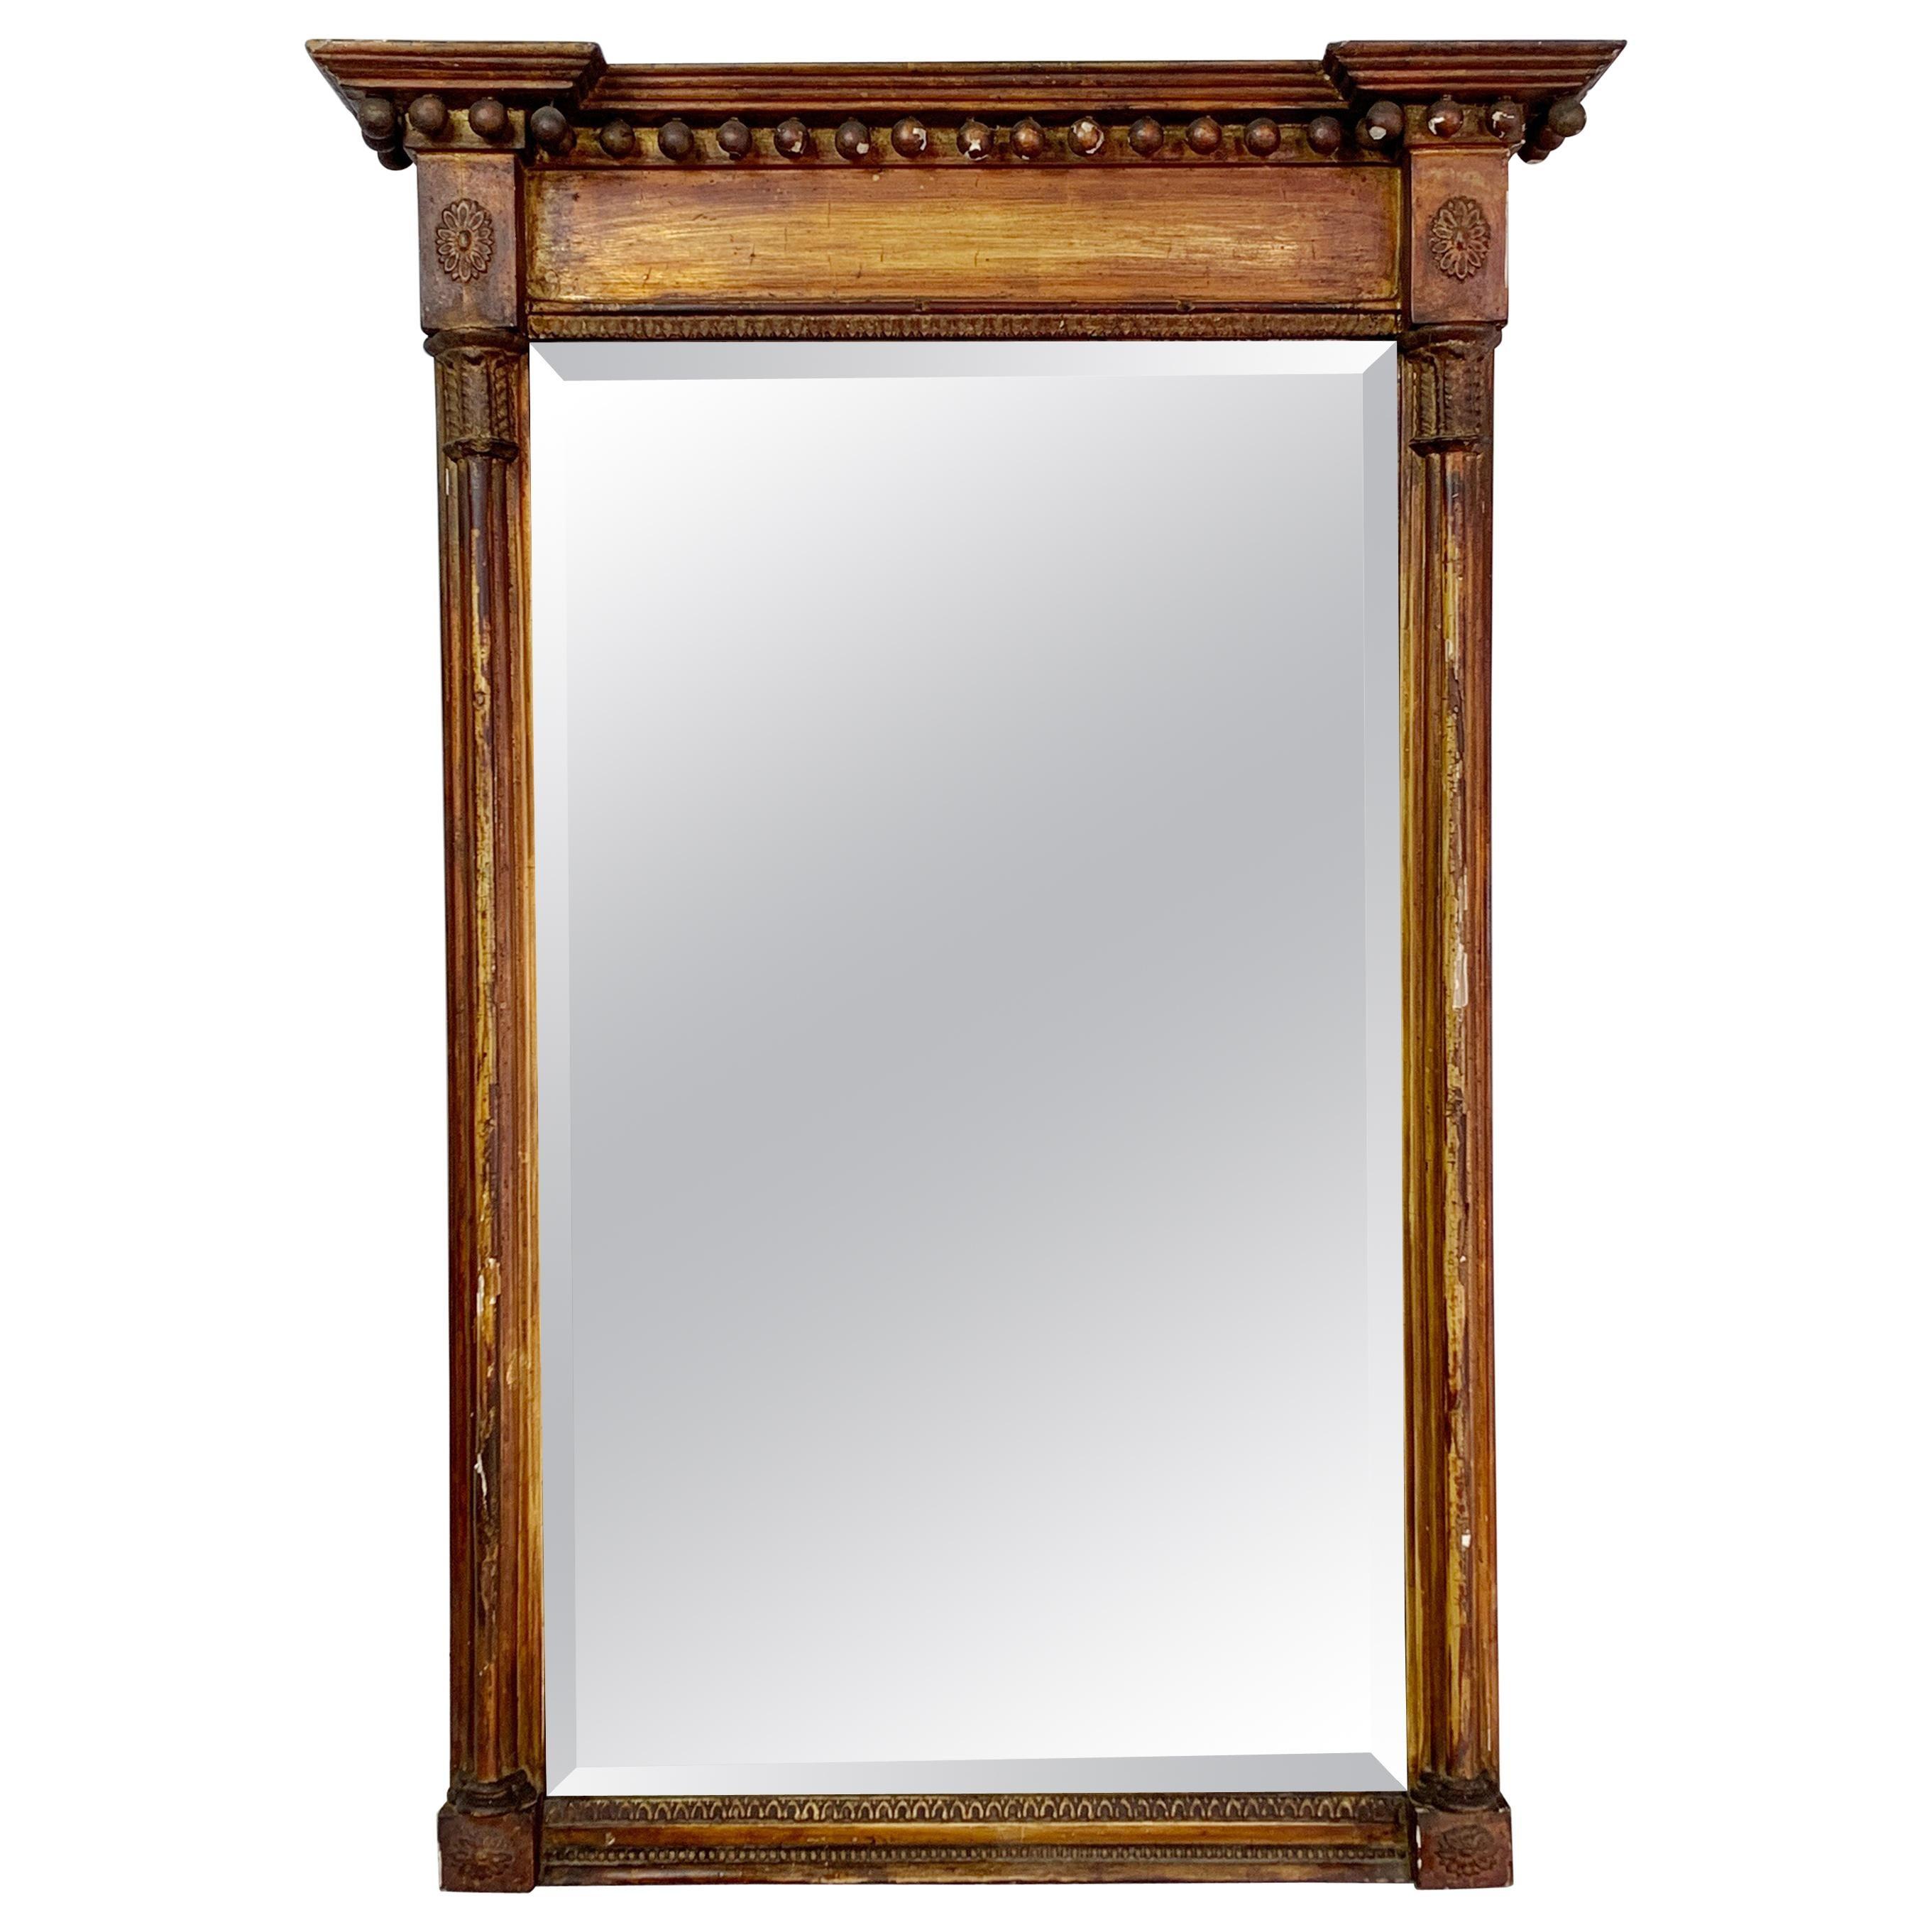 Antique Gilt Empire Trumeau Mirror, Foxed, circa 1820